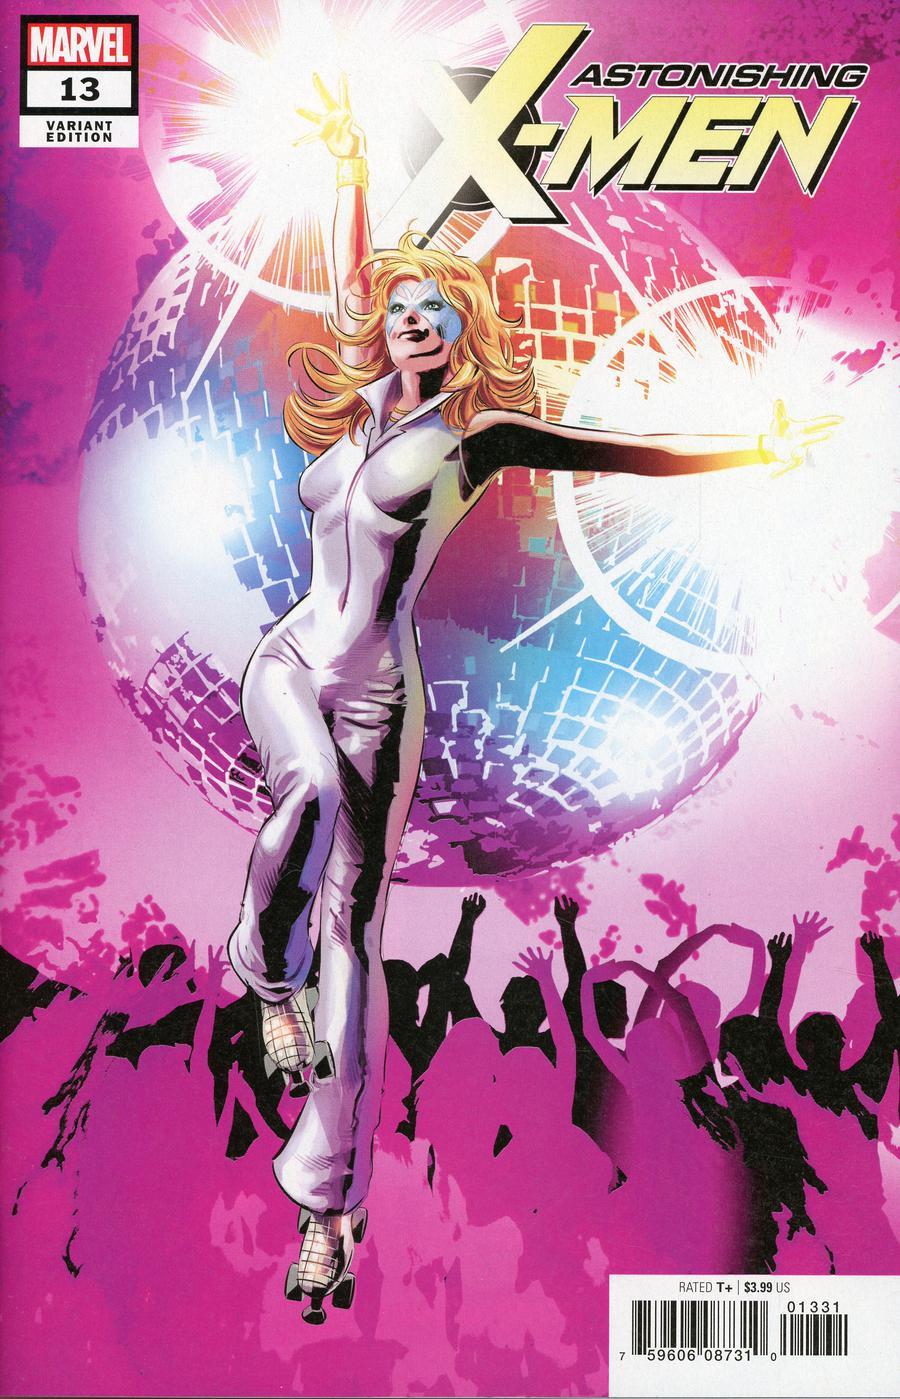 Astonishing X-Men Vol 4 #13 Cover B Variant Mike Deodato Jr Cover